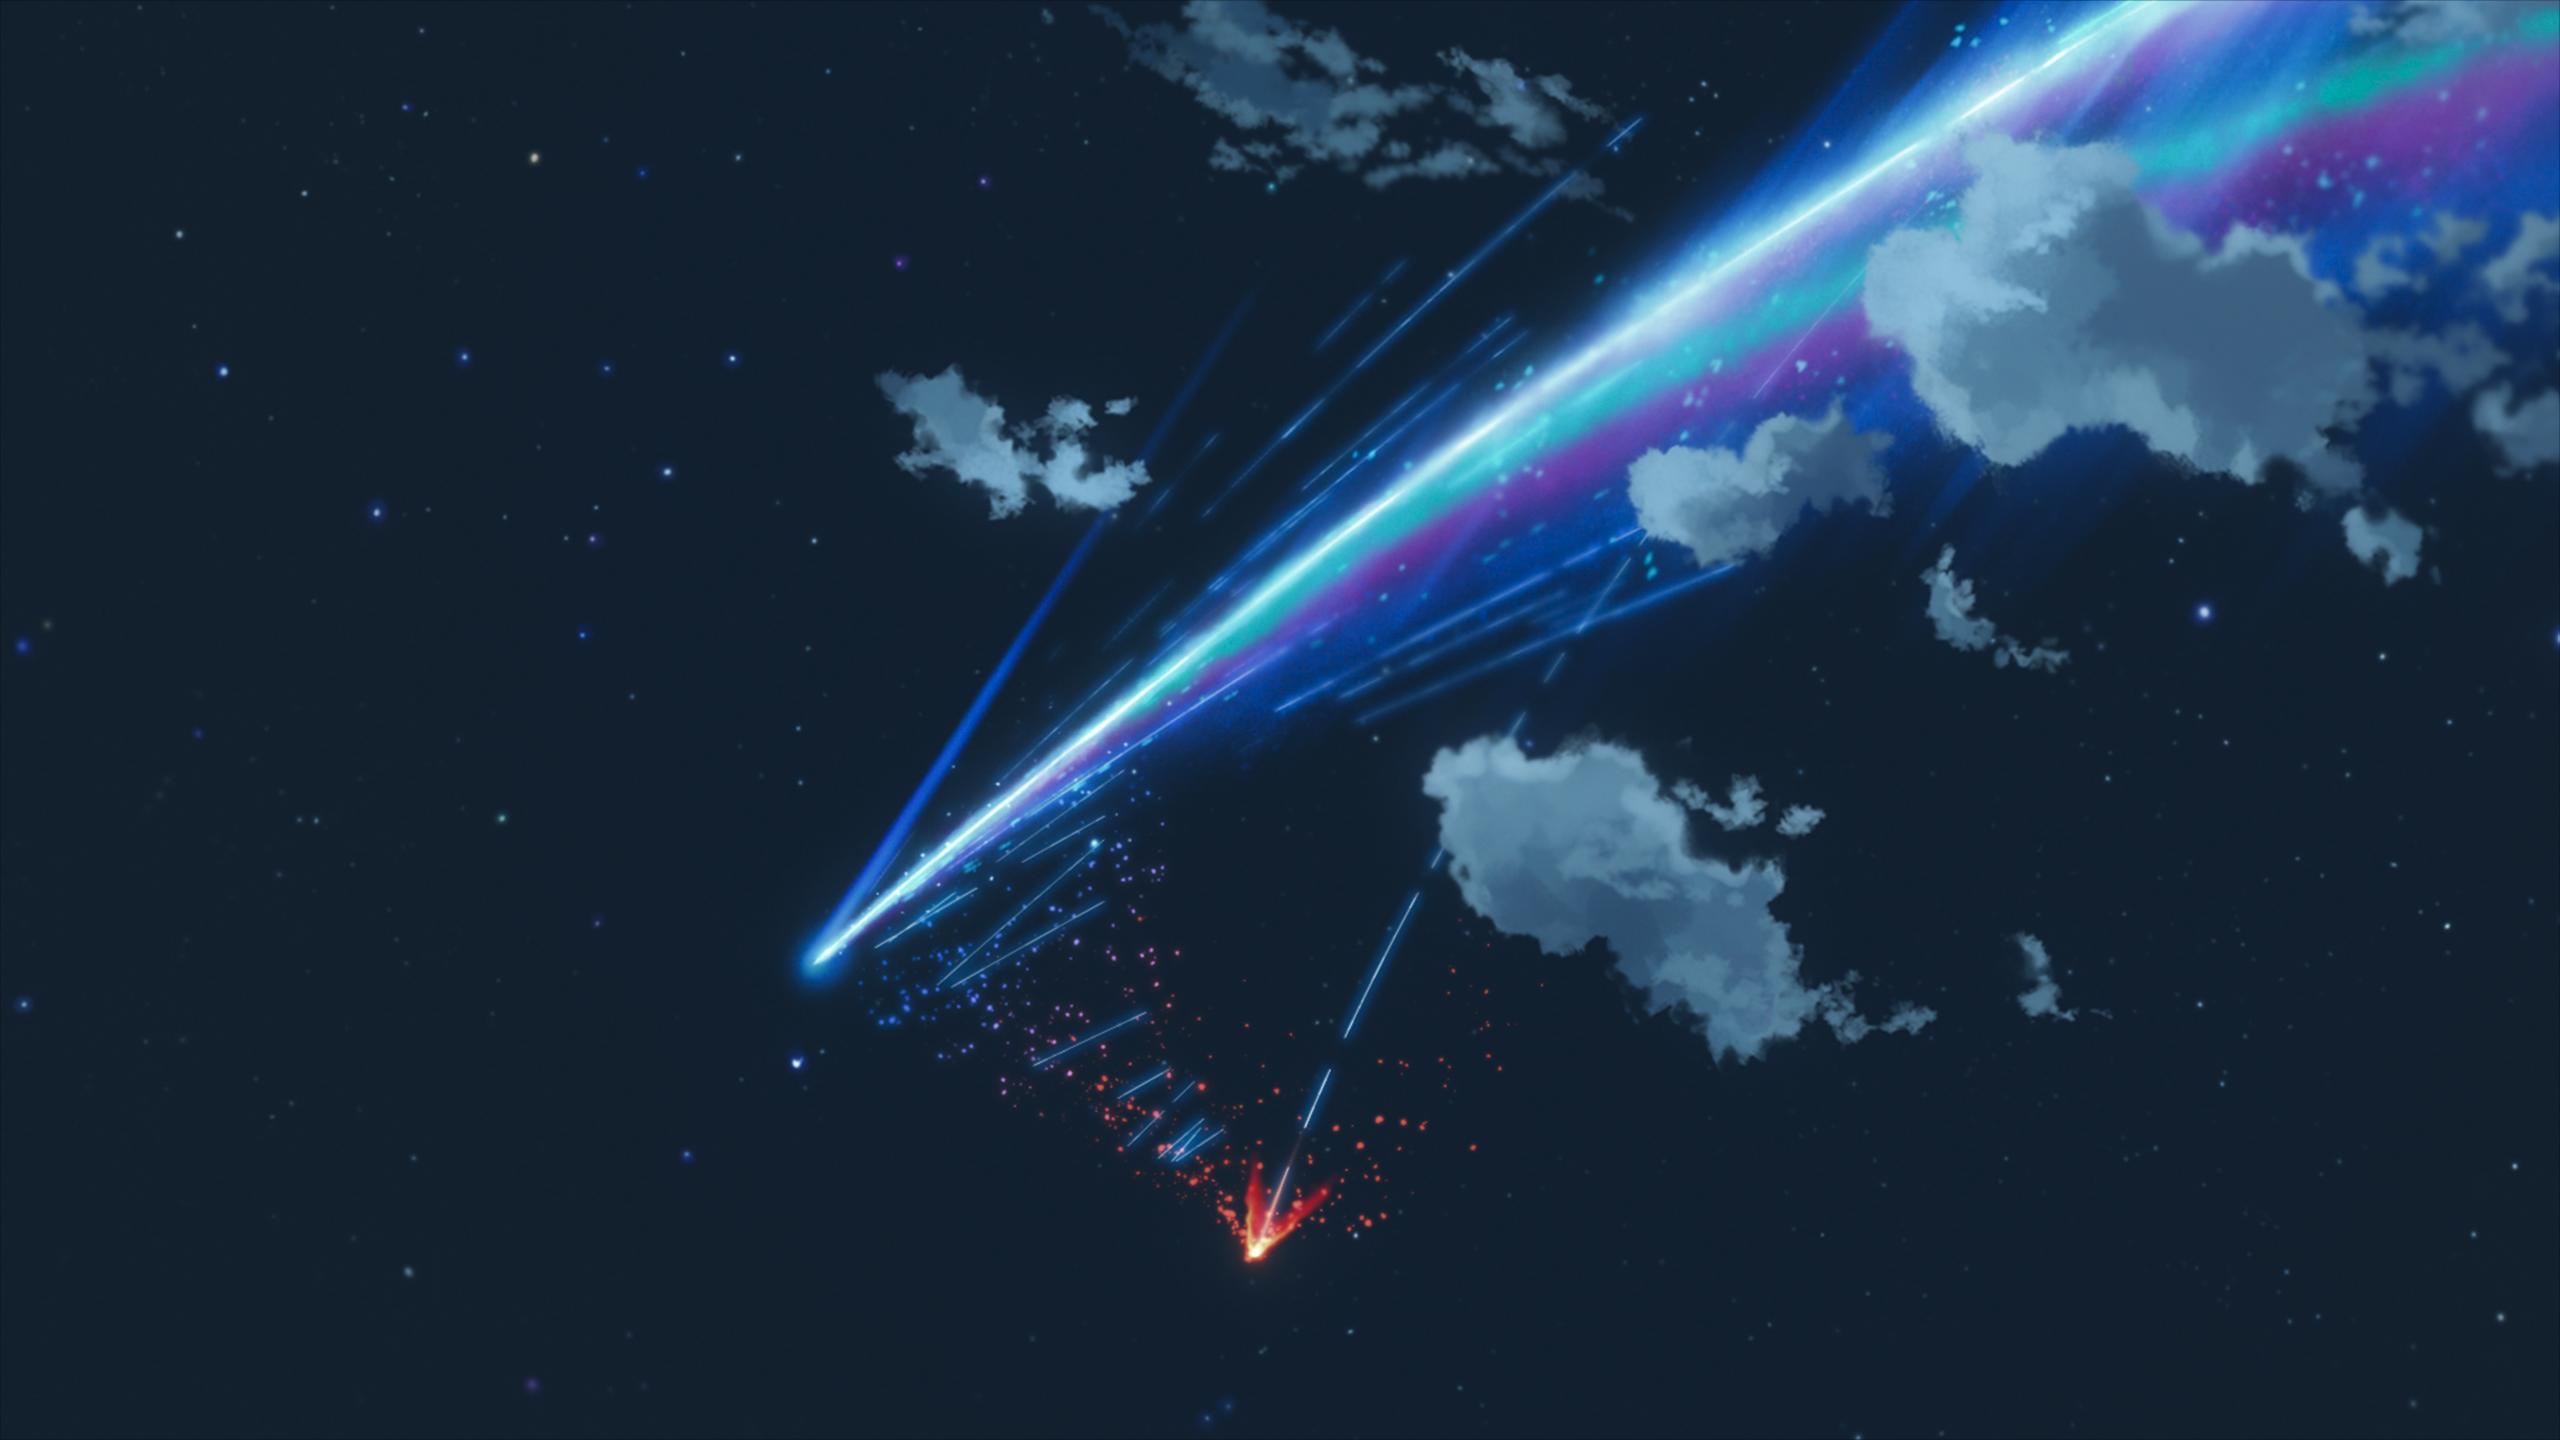 Meteor Kimi No Nawa Gif 2560x1440 Wallpaper Teahub Io